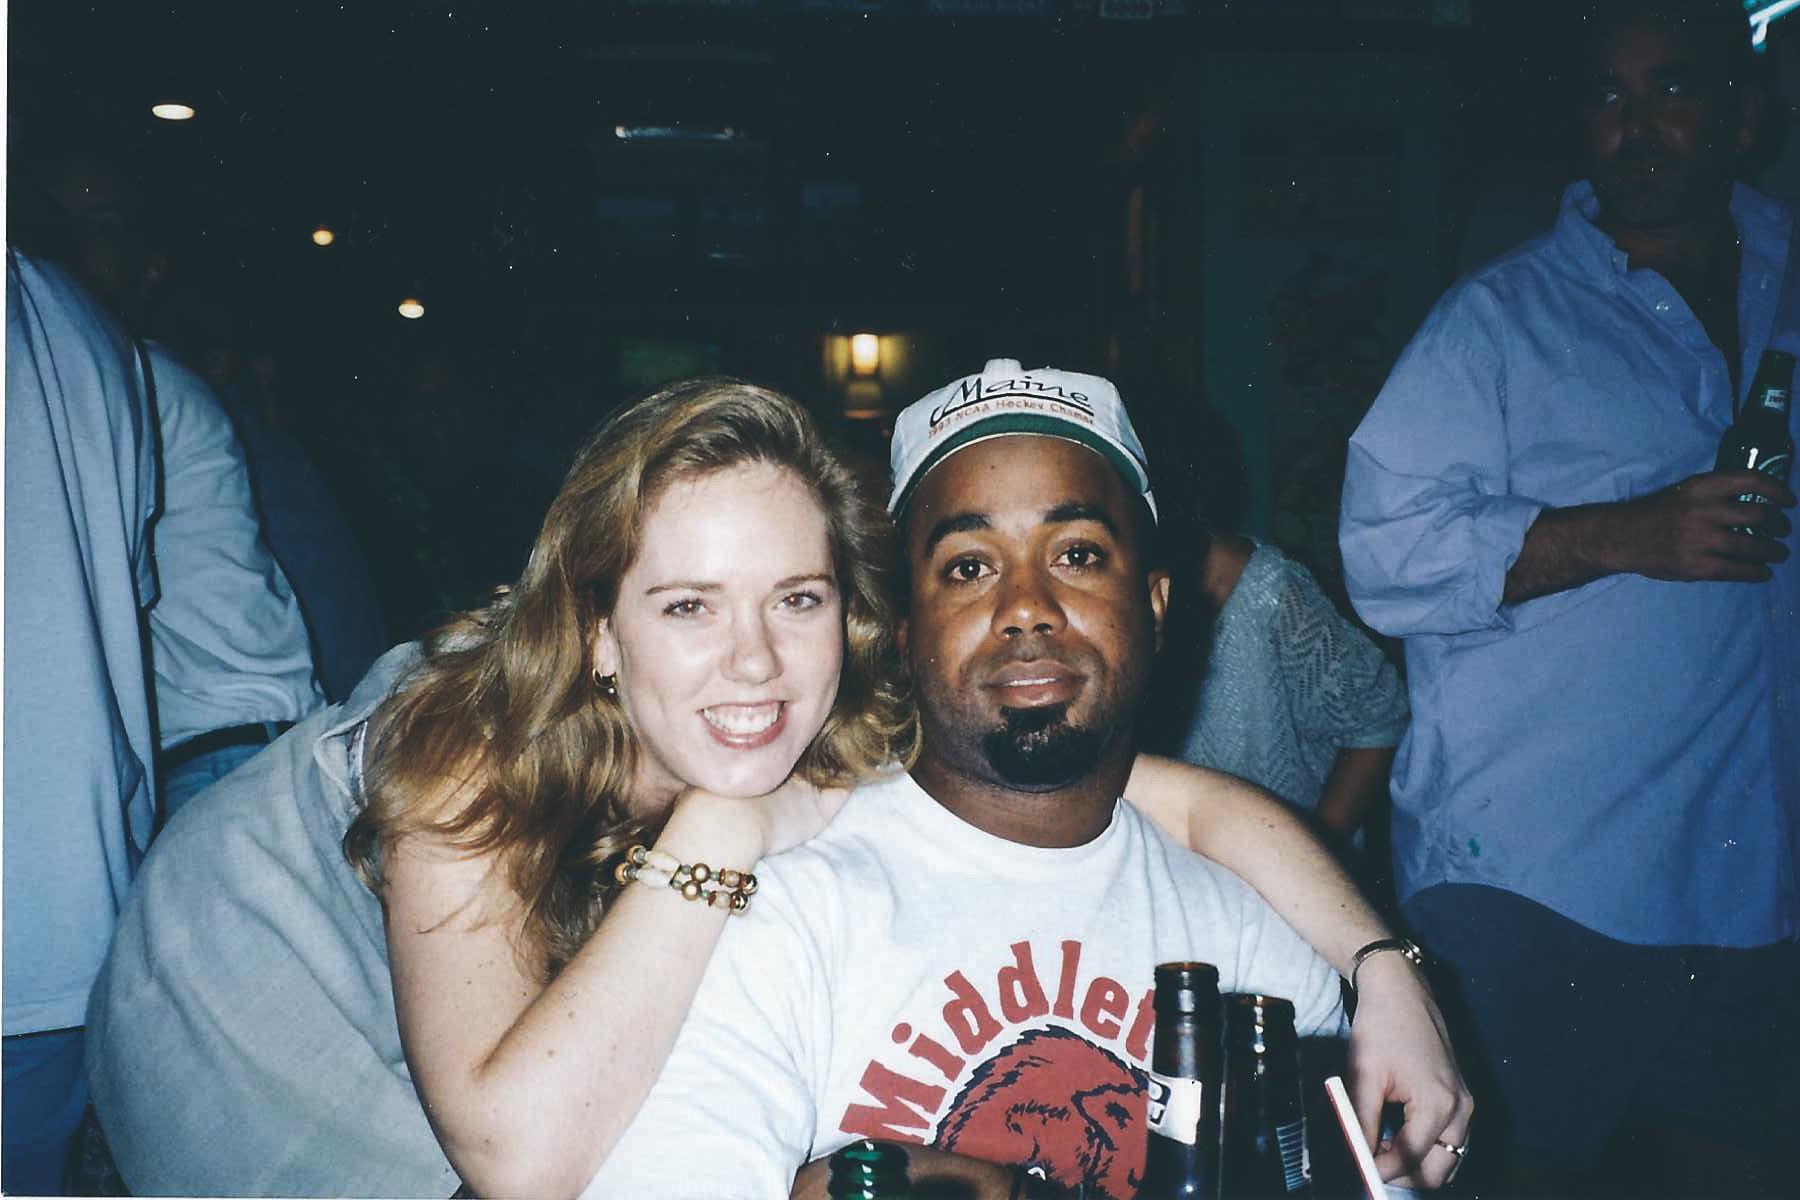 Me & Hooty,Bermuda 1995